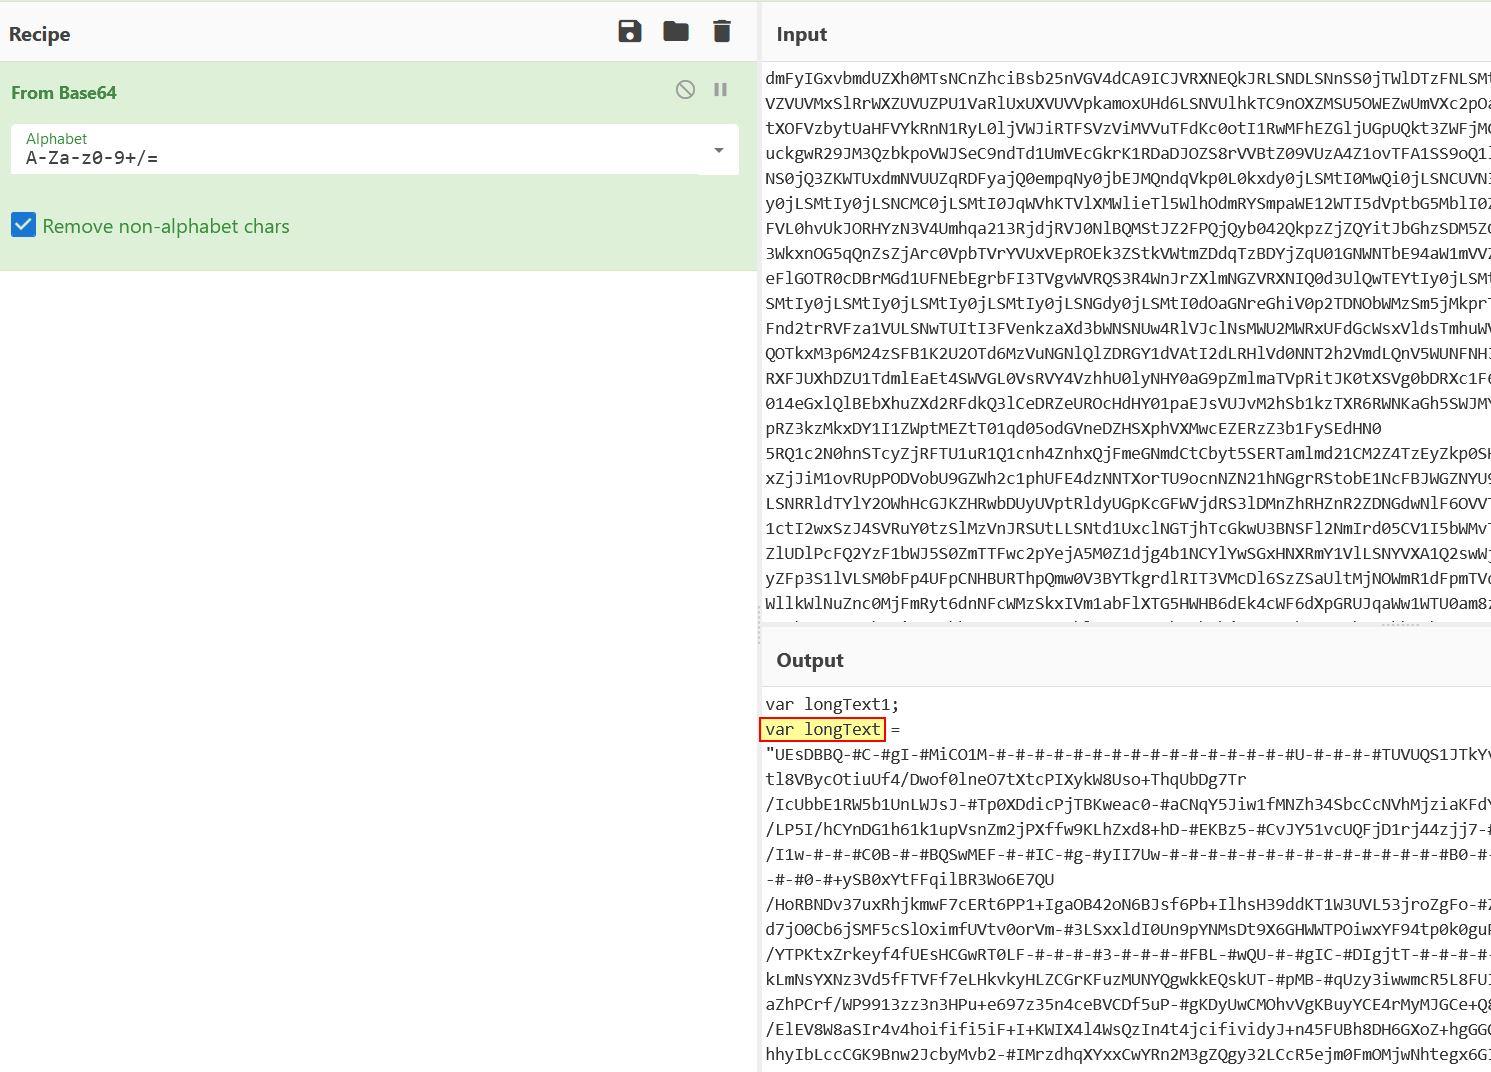 CyberChef Decoded Base64